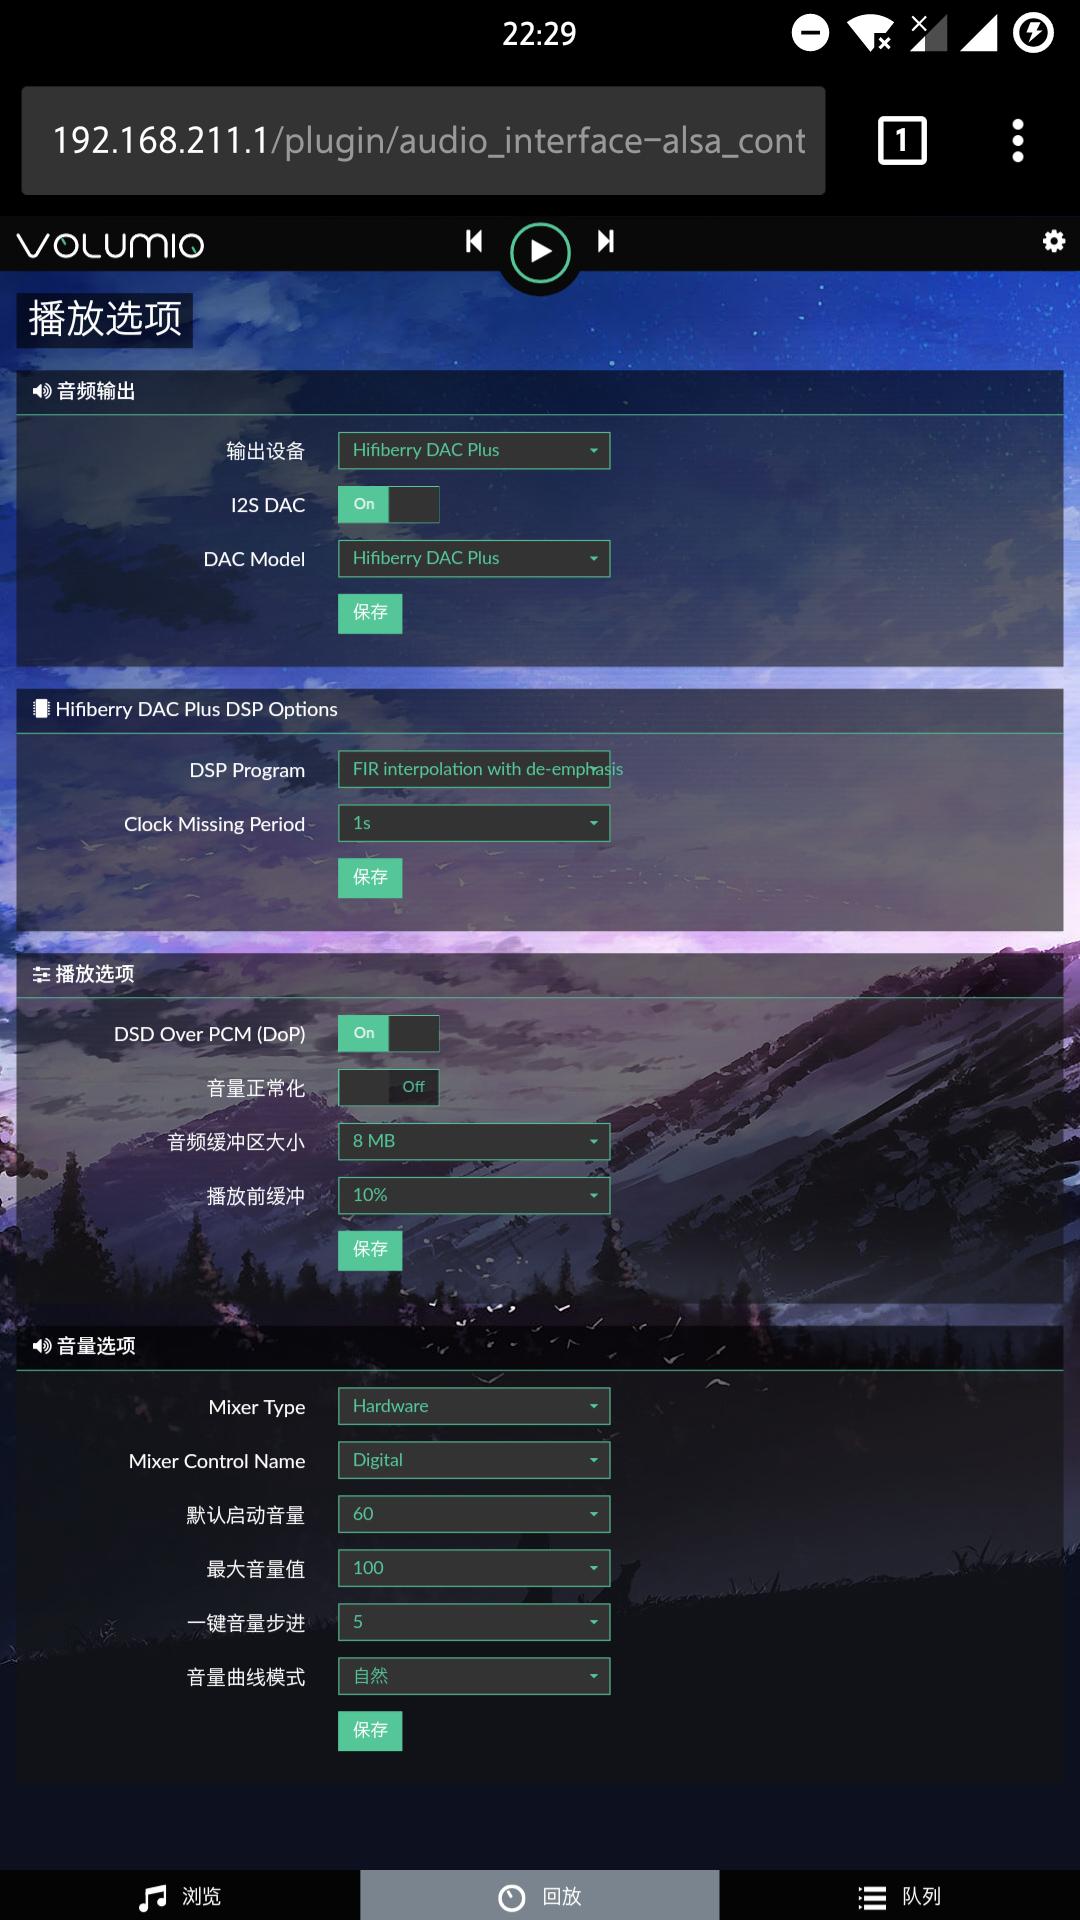 Screenshot_20170220-222914.png